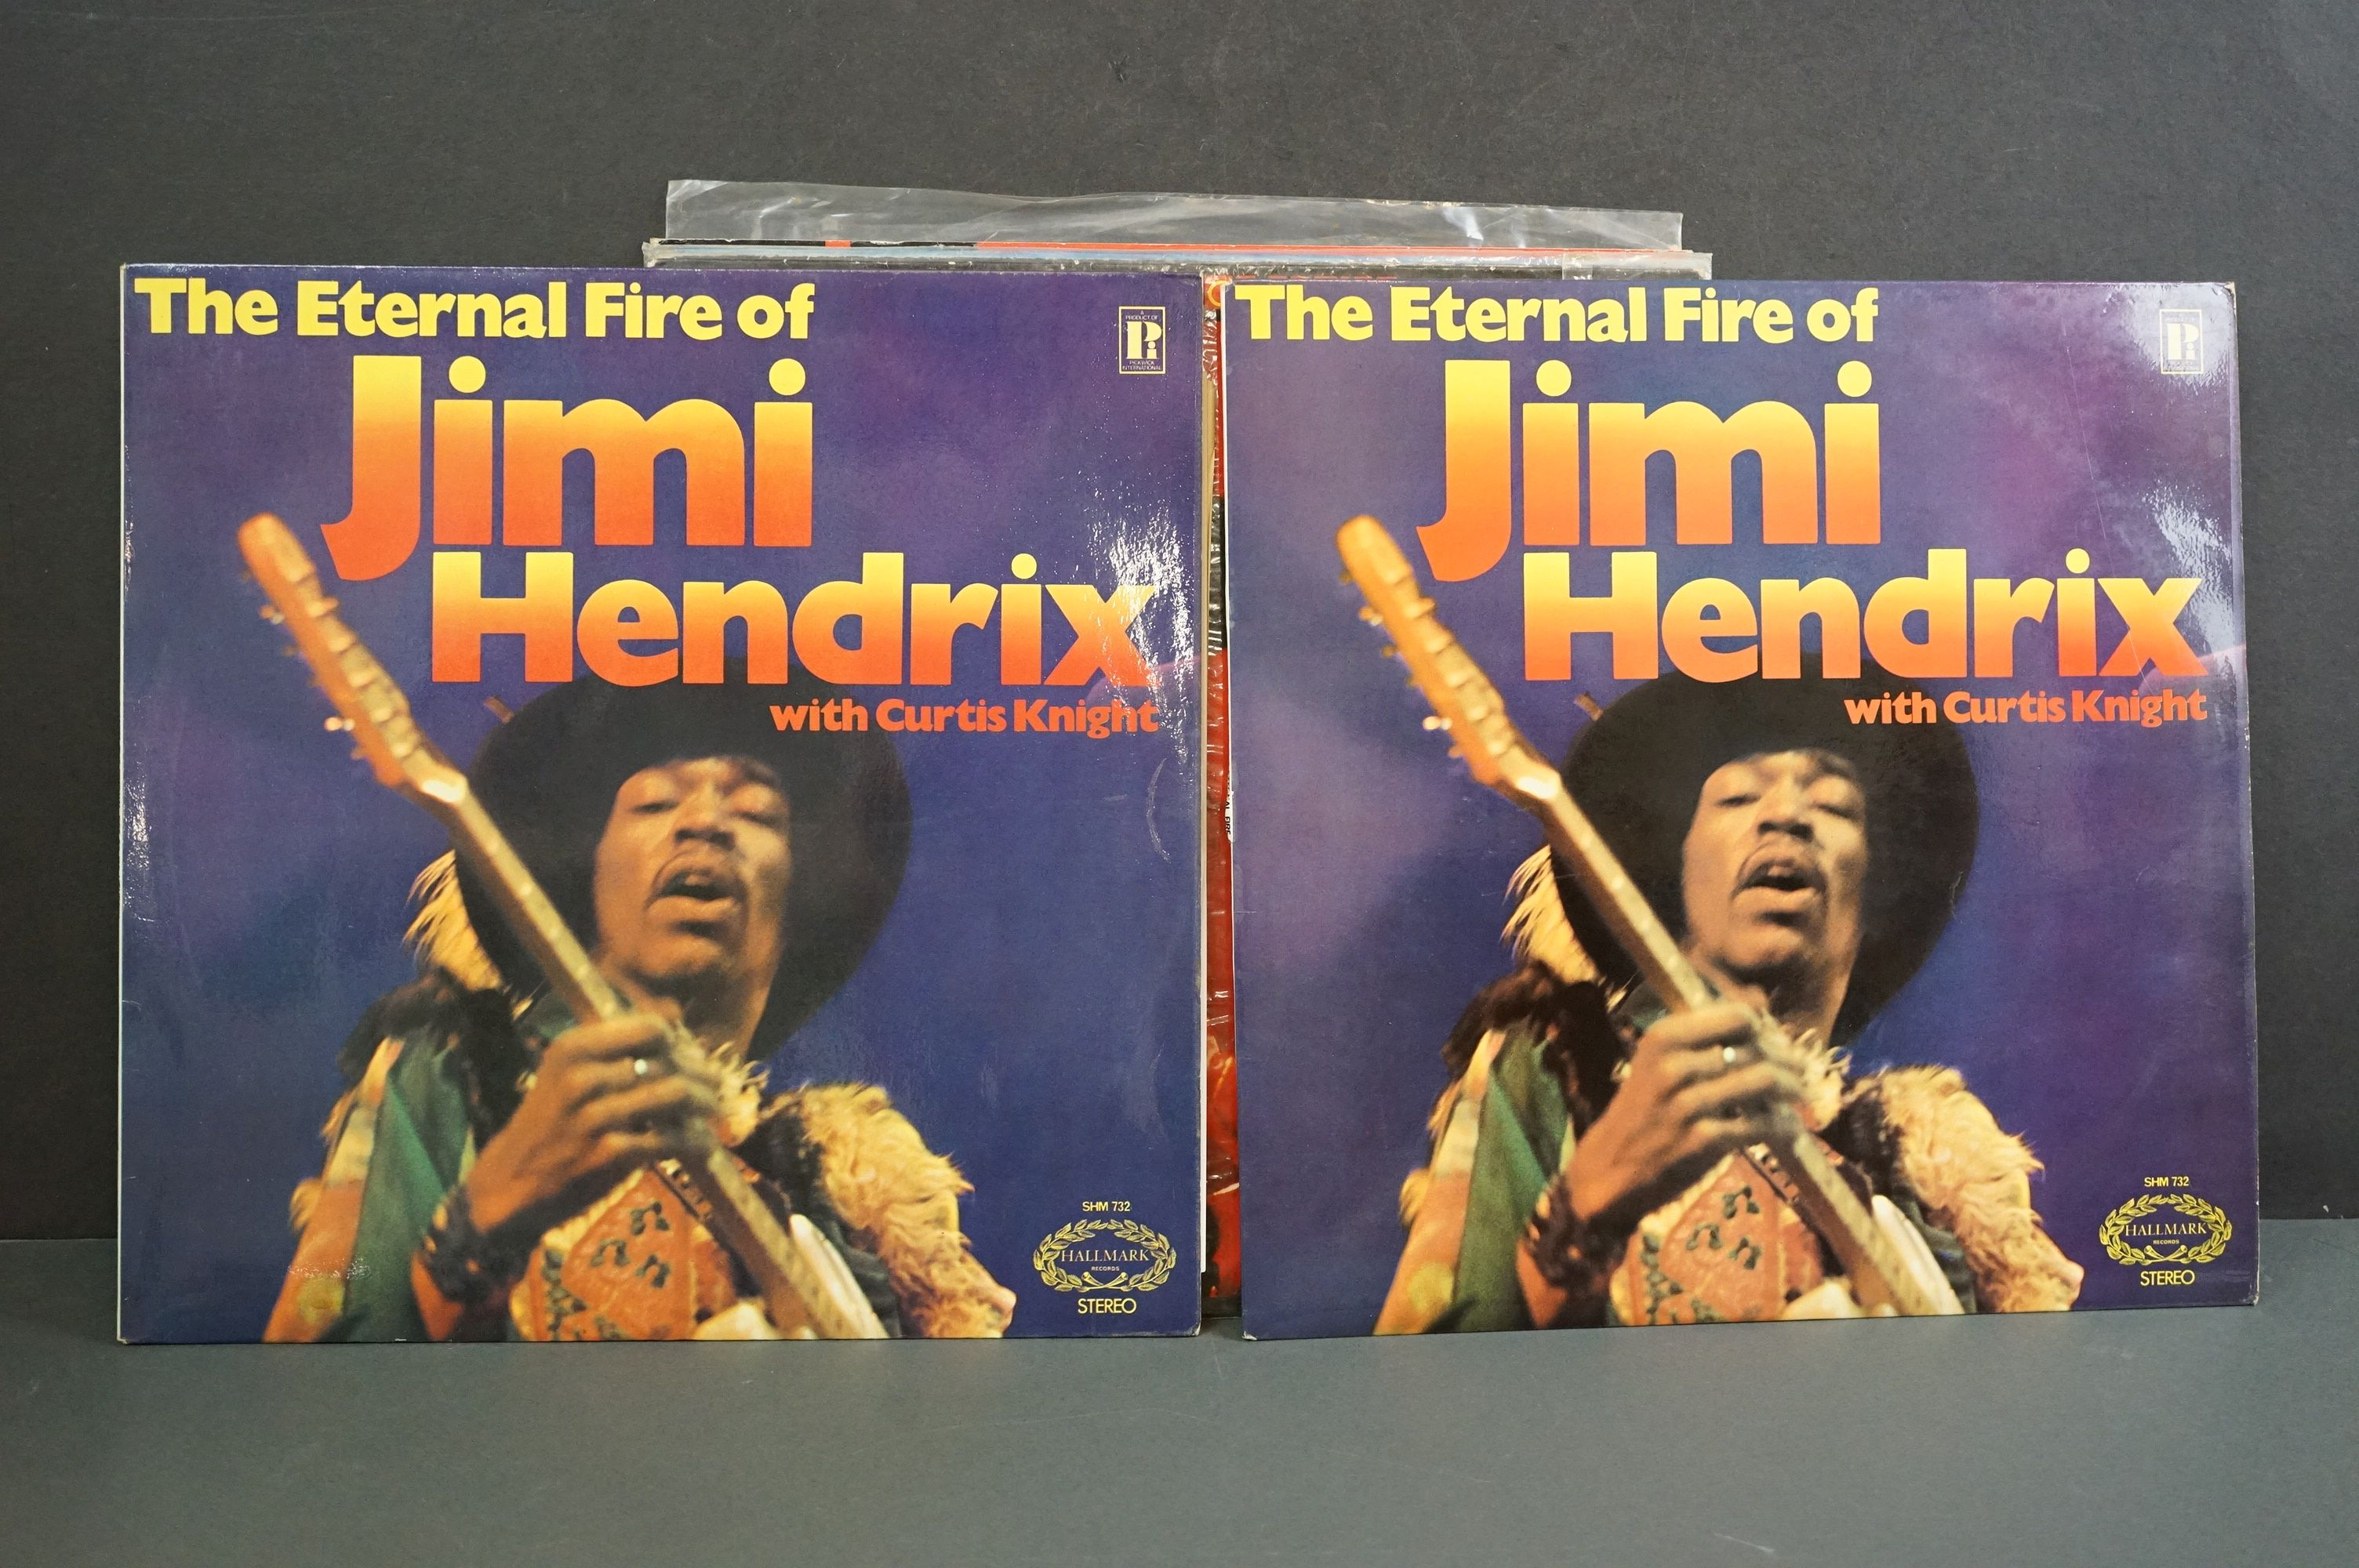 Vinyl - Nine Jimi Hendrix LPs to include Smash Hits, Hey Joe (Italian pressing), Stone Free, Jimi - Image 3 of 9